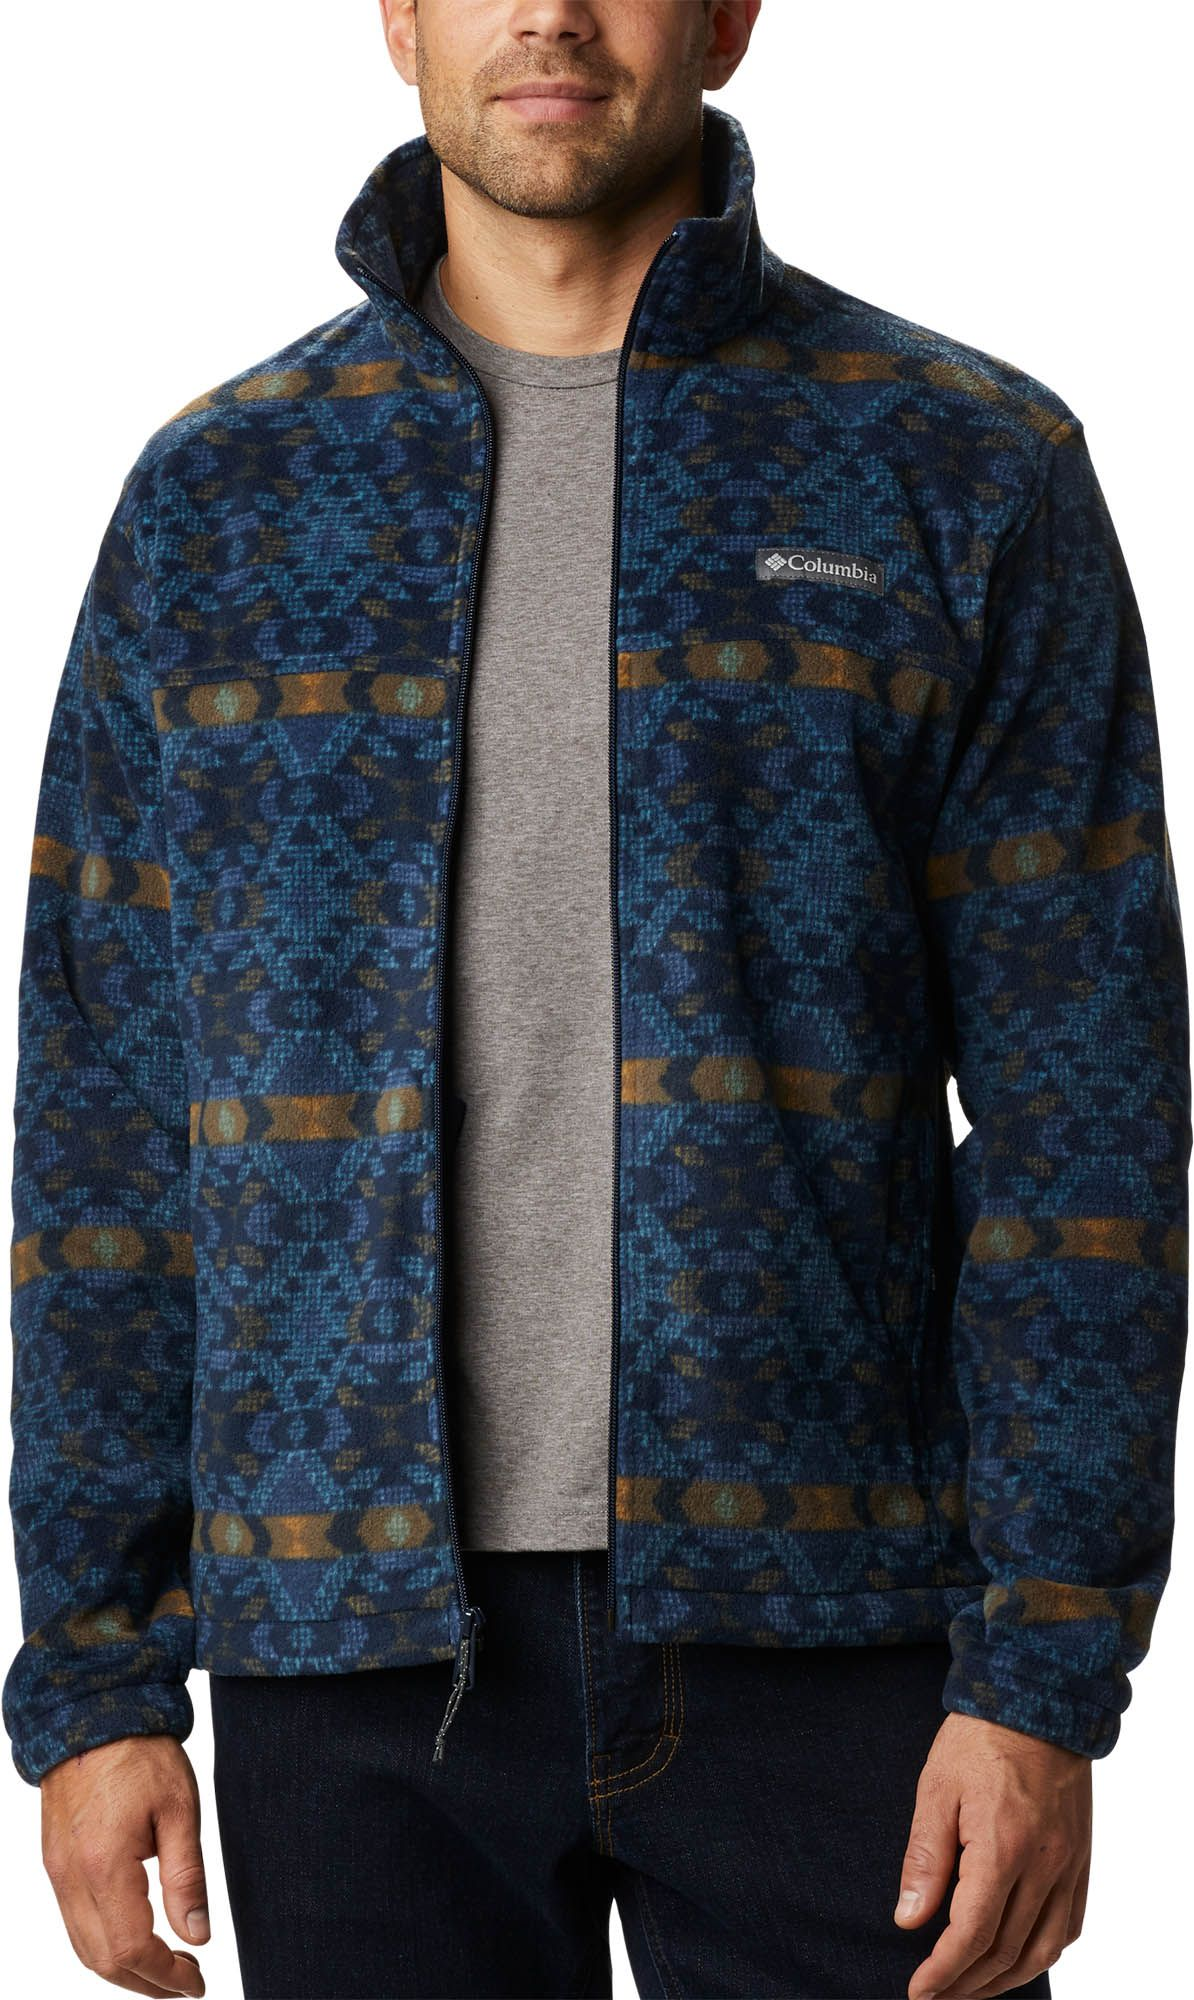 Columbia Men's Steens Mountain Print Fleece Jacket, Small, Blue